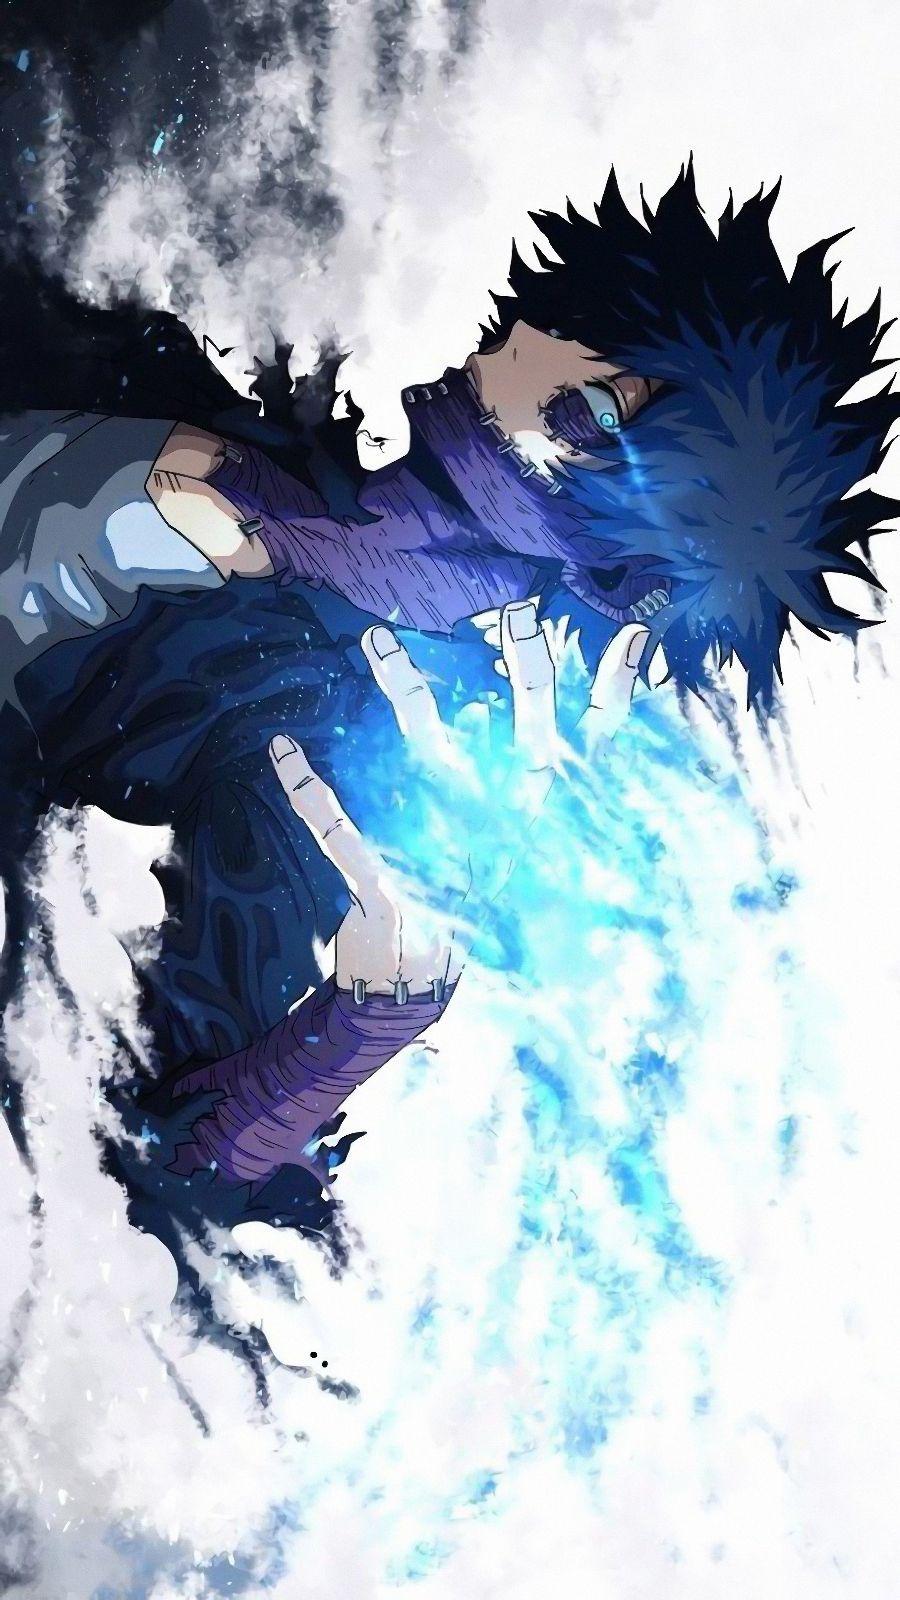 Iphone Xr Wallpaper Anime : iphone, wallpaper, anime, IPhone, Flexible, Protector, Cover, Character, Hero,, Academia, Manga